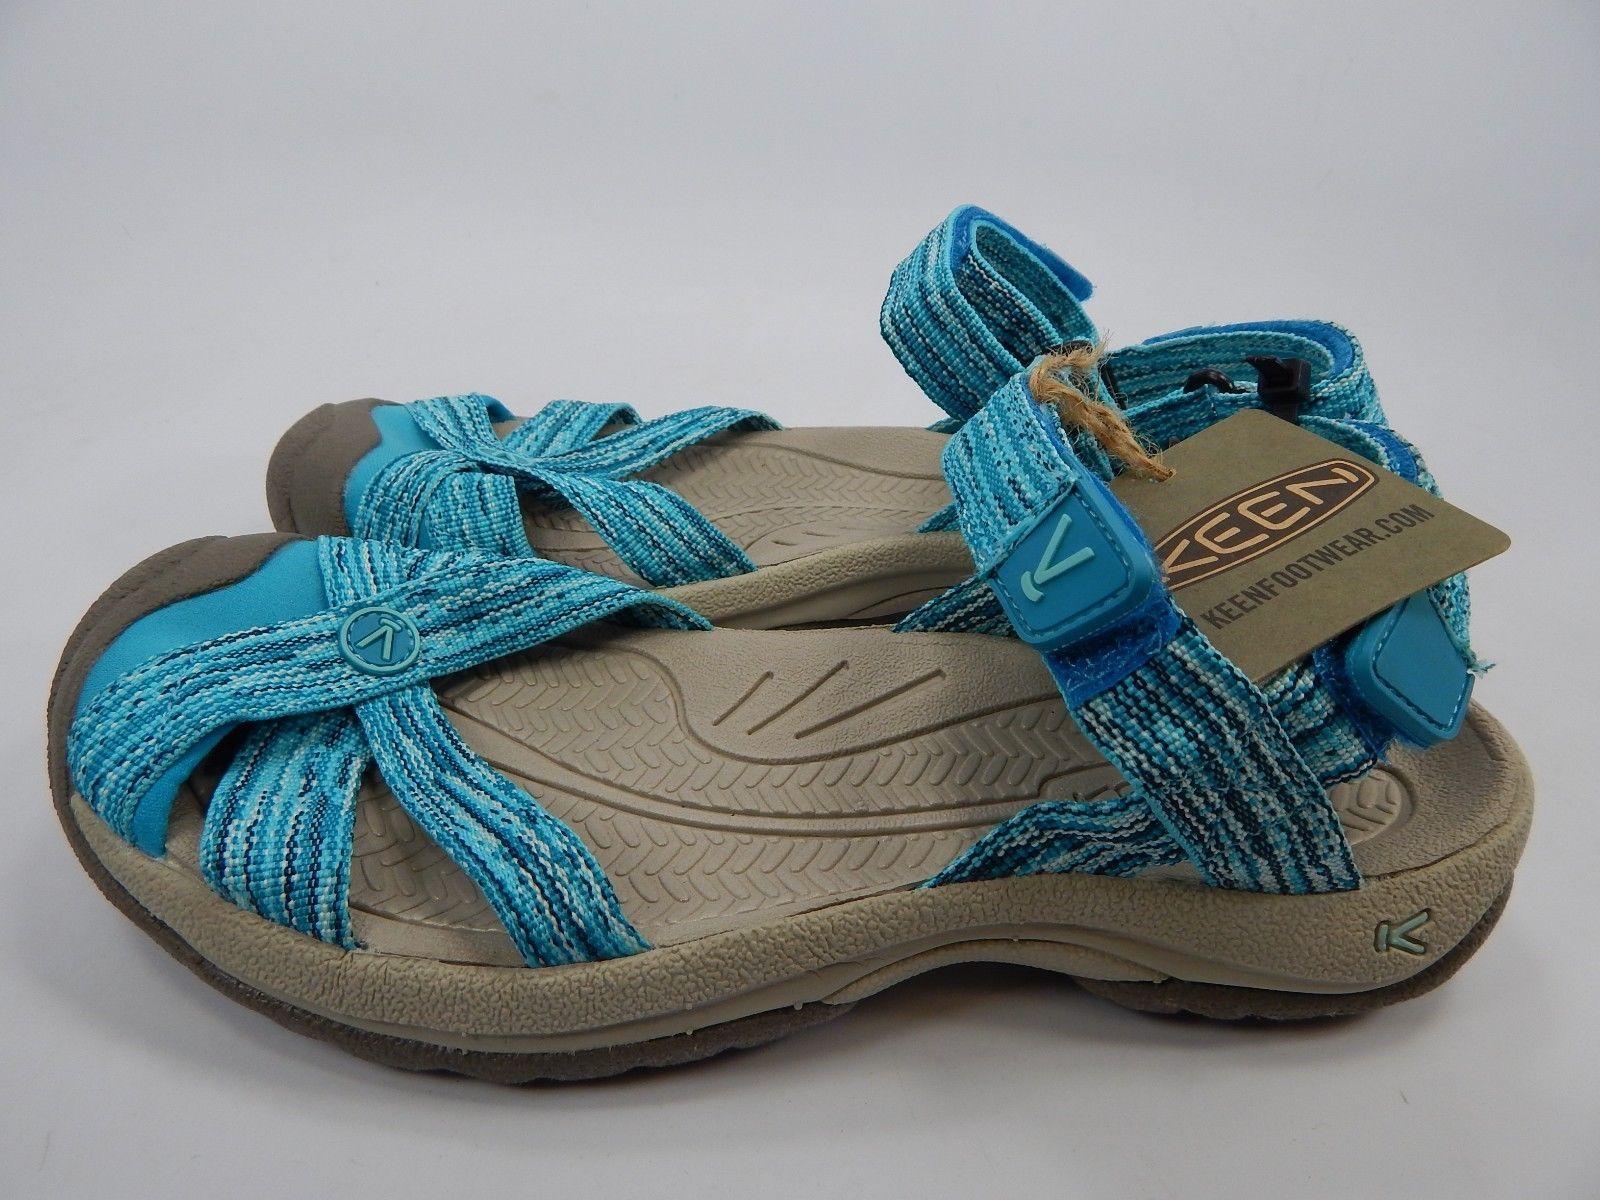 7b94176c57e MISMATCH Keen Bali Strap Size 9 M Left   Size 7.5 M Right Women s Sports  Sandals